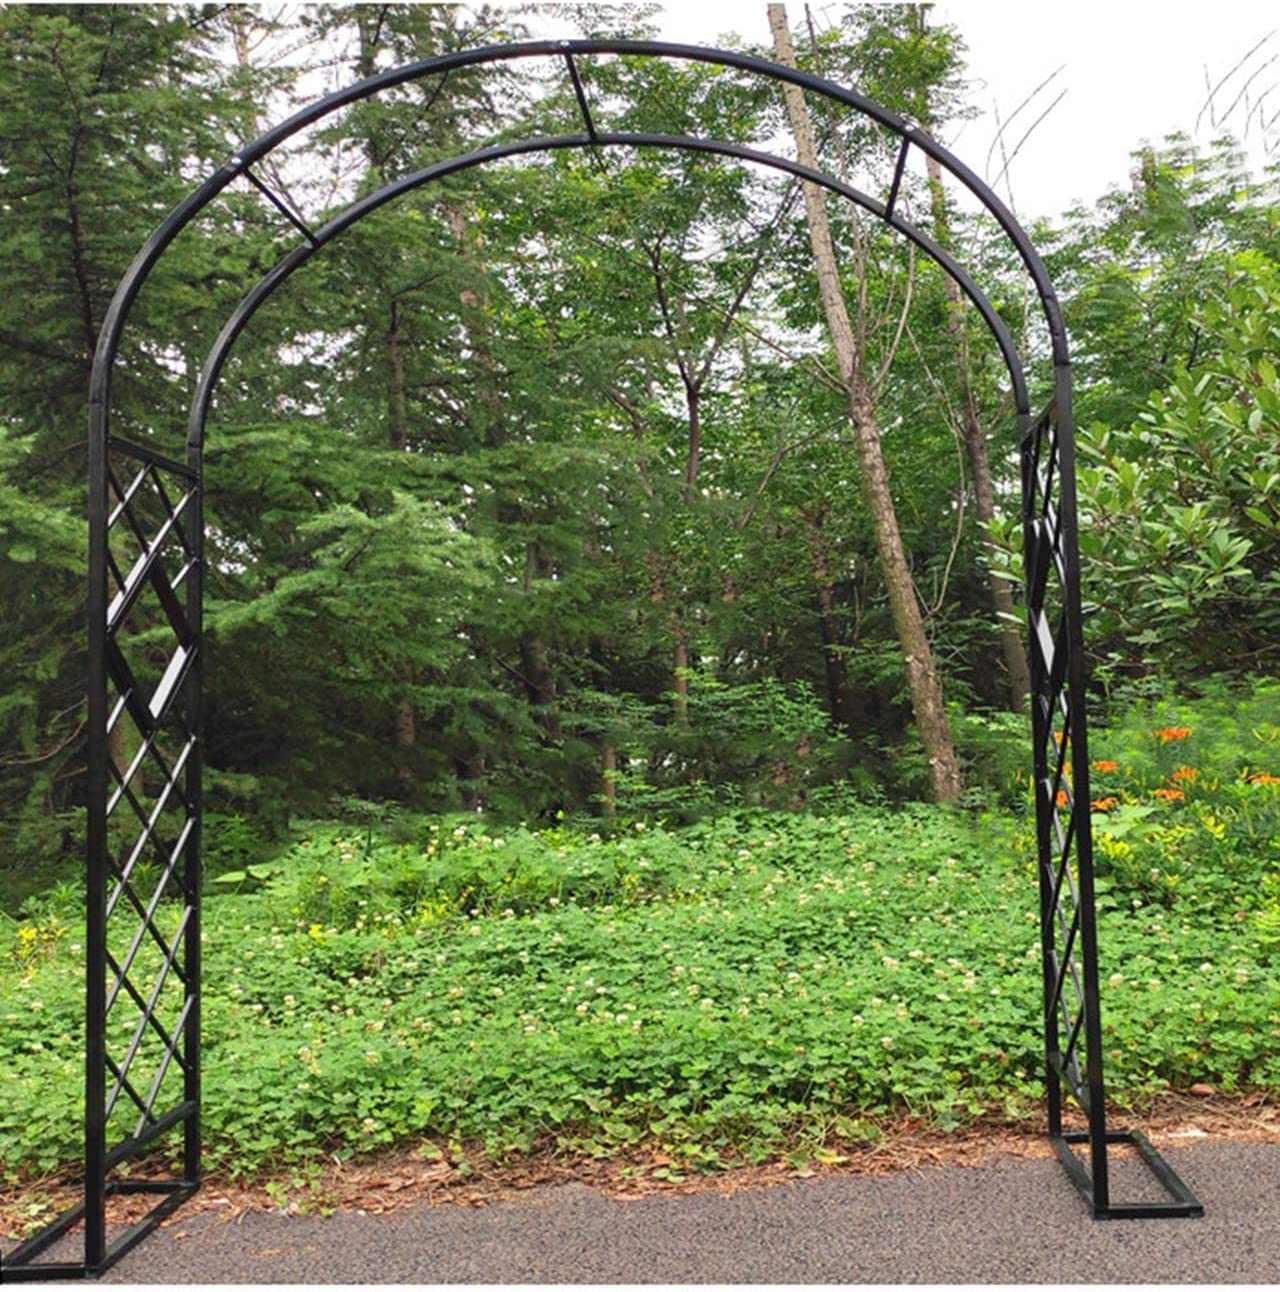 F-XW Garden Arch Metal Arbor Pergola Arbour Trellis Wedding Archway for Climbing Plants Outdoor Garden Lawn Backyard Patio, Black, White